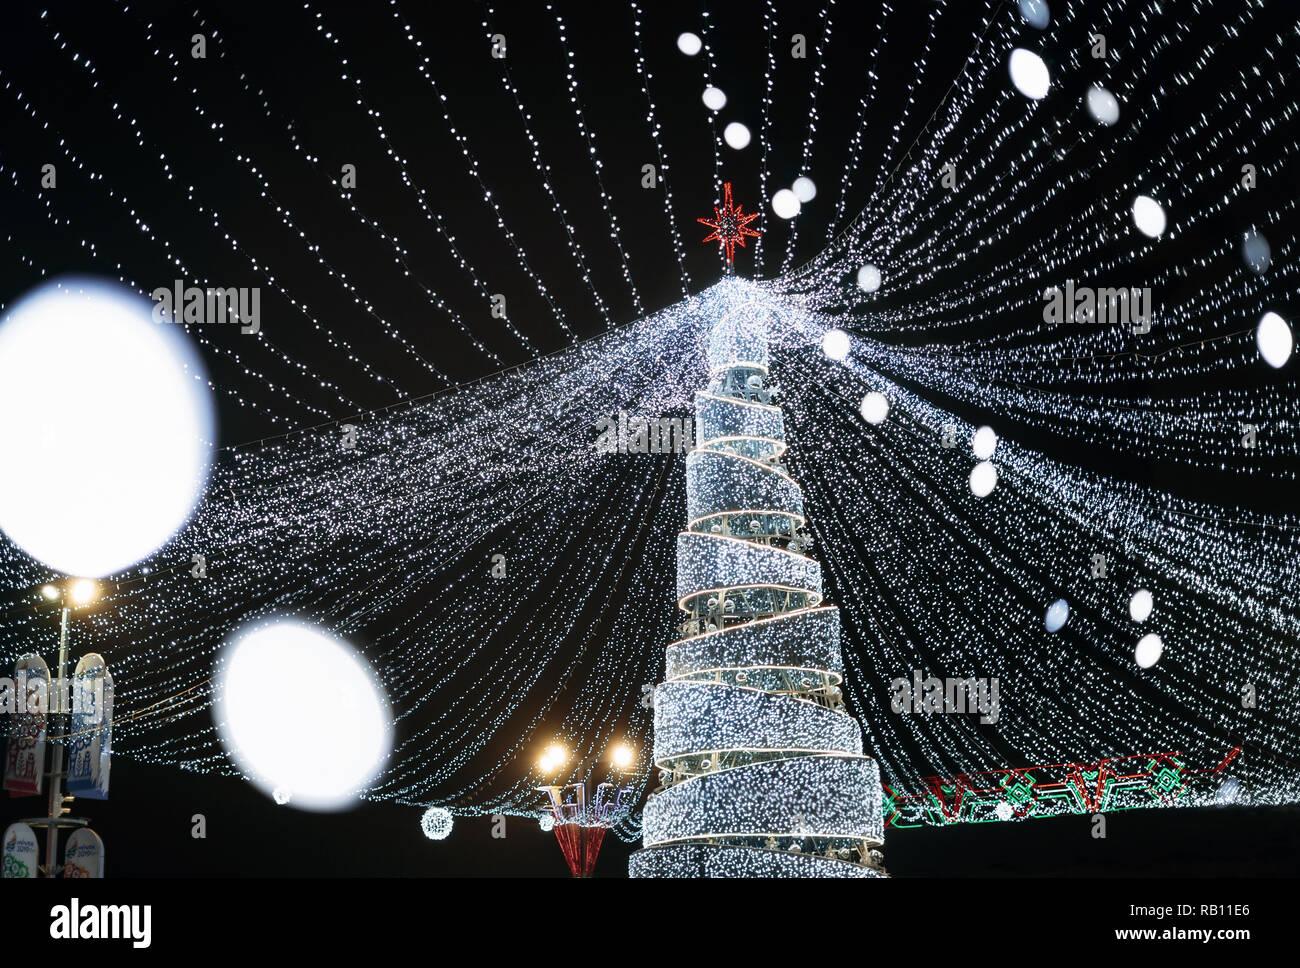 Minsk, Belarus - December 28, 2018: View of a Christmas tree 2019 at Pobediteley avenue in Minsk, Belarus - Stock Image